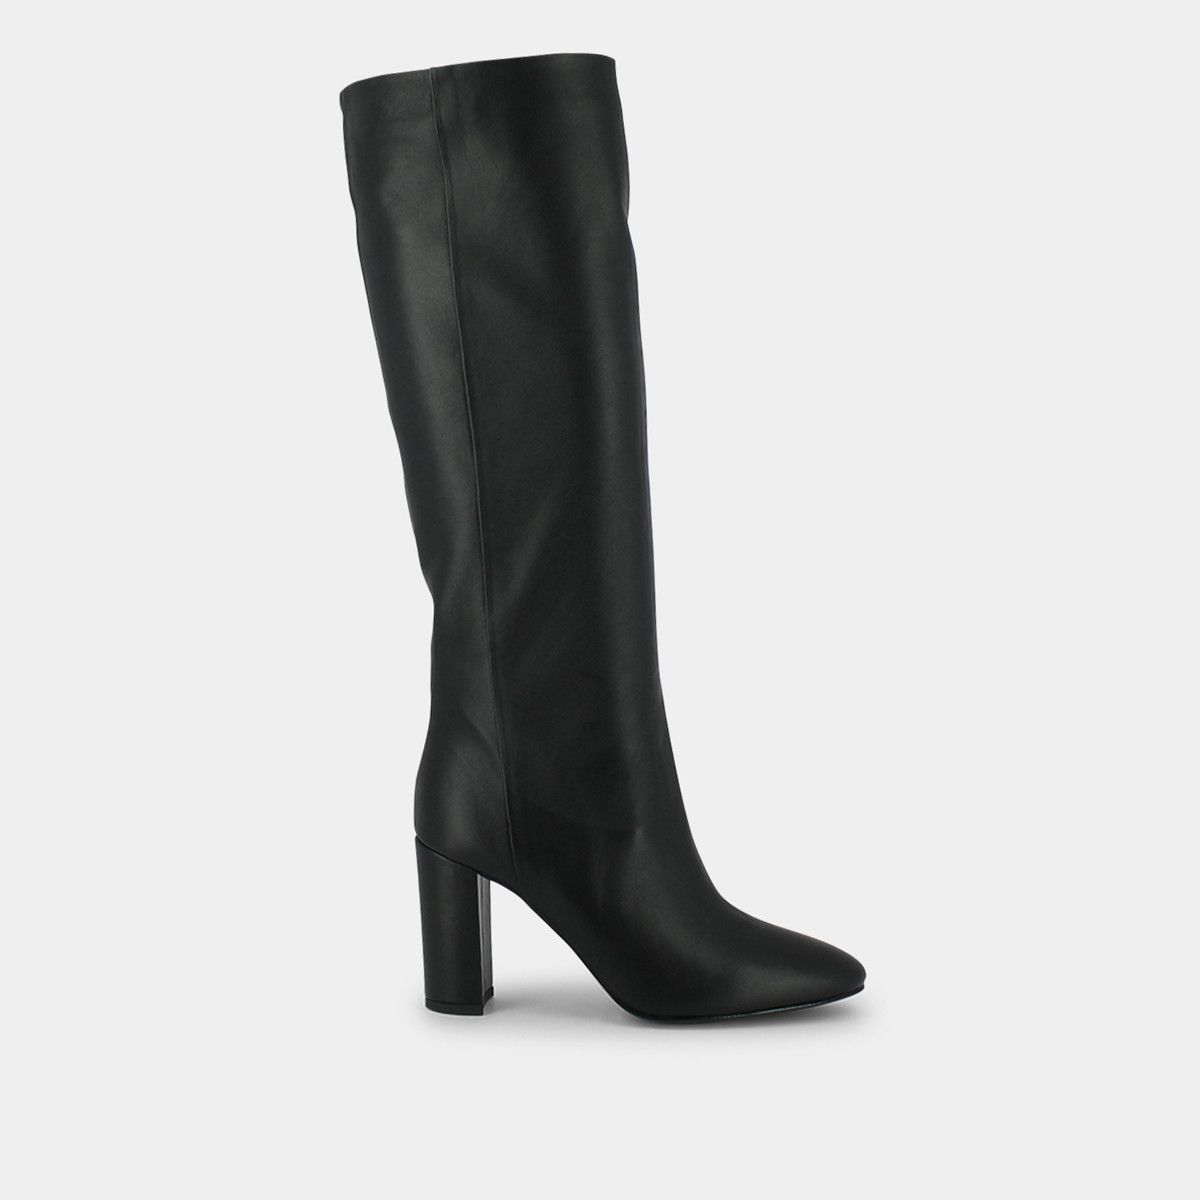 Bottes hautes Femme en velours noir | Jonak